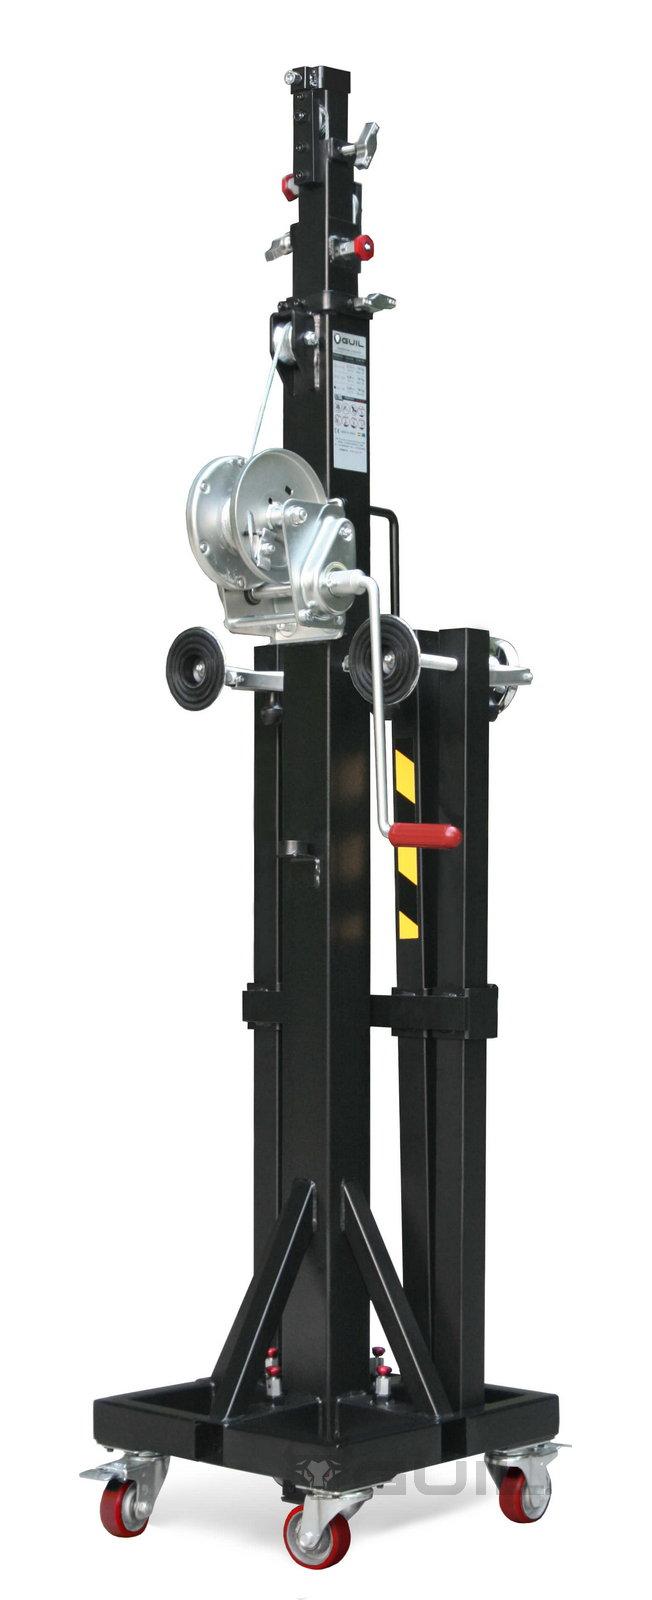 Materiaallift 1,8-5,4 m 180 kg (2)